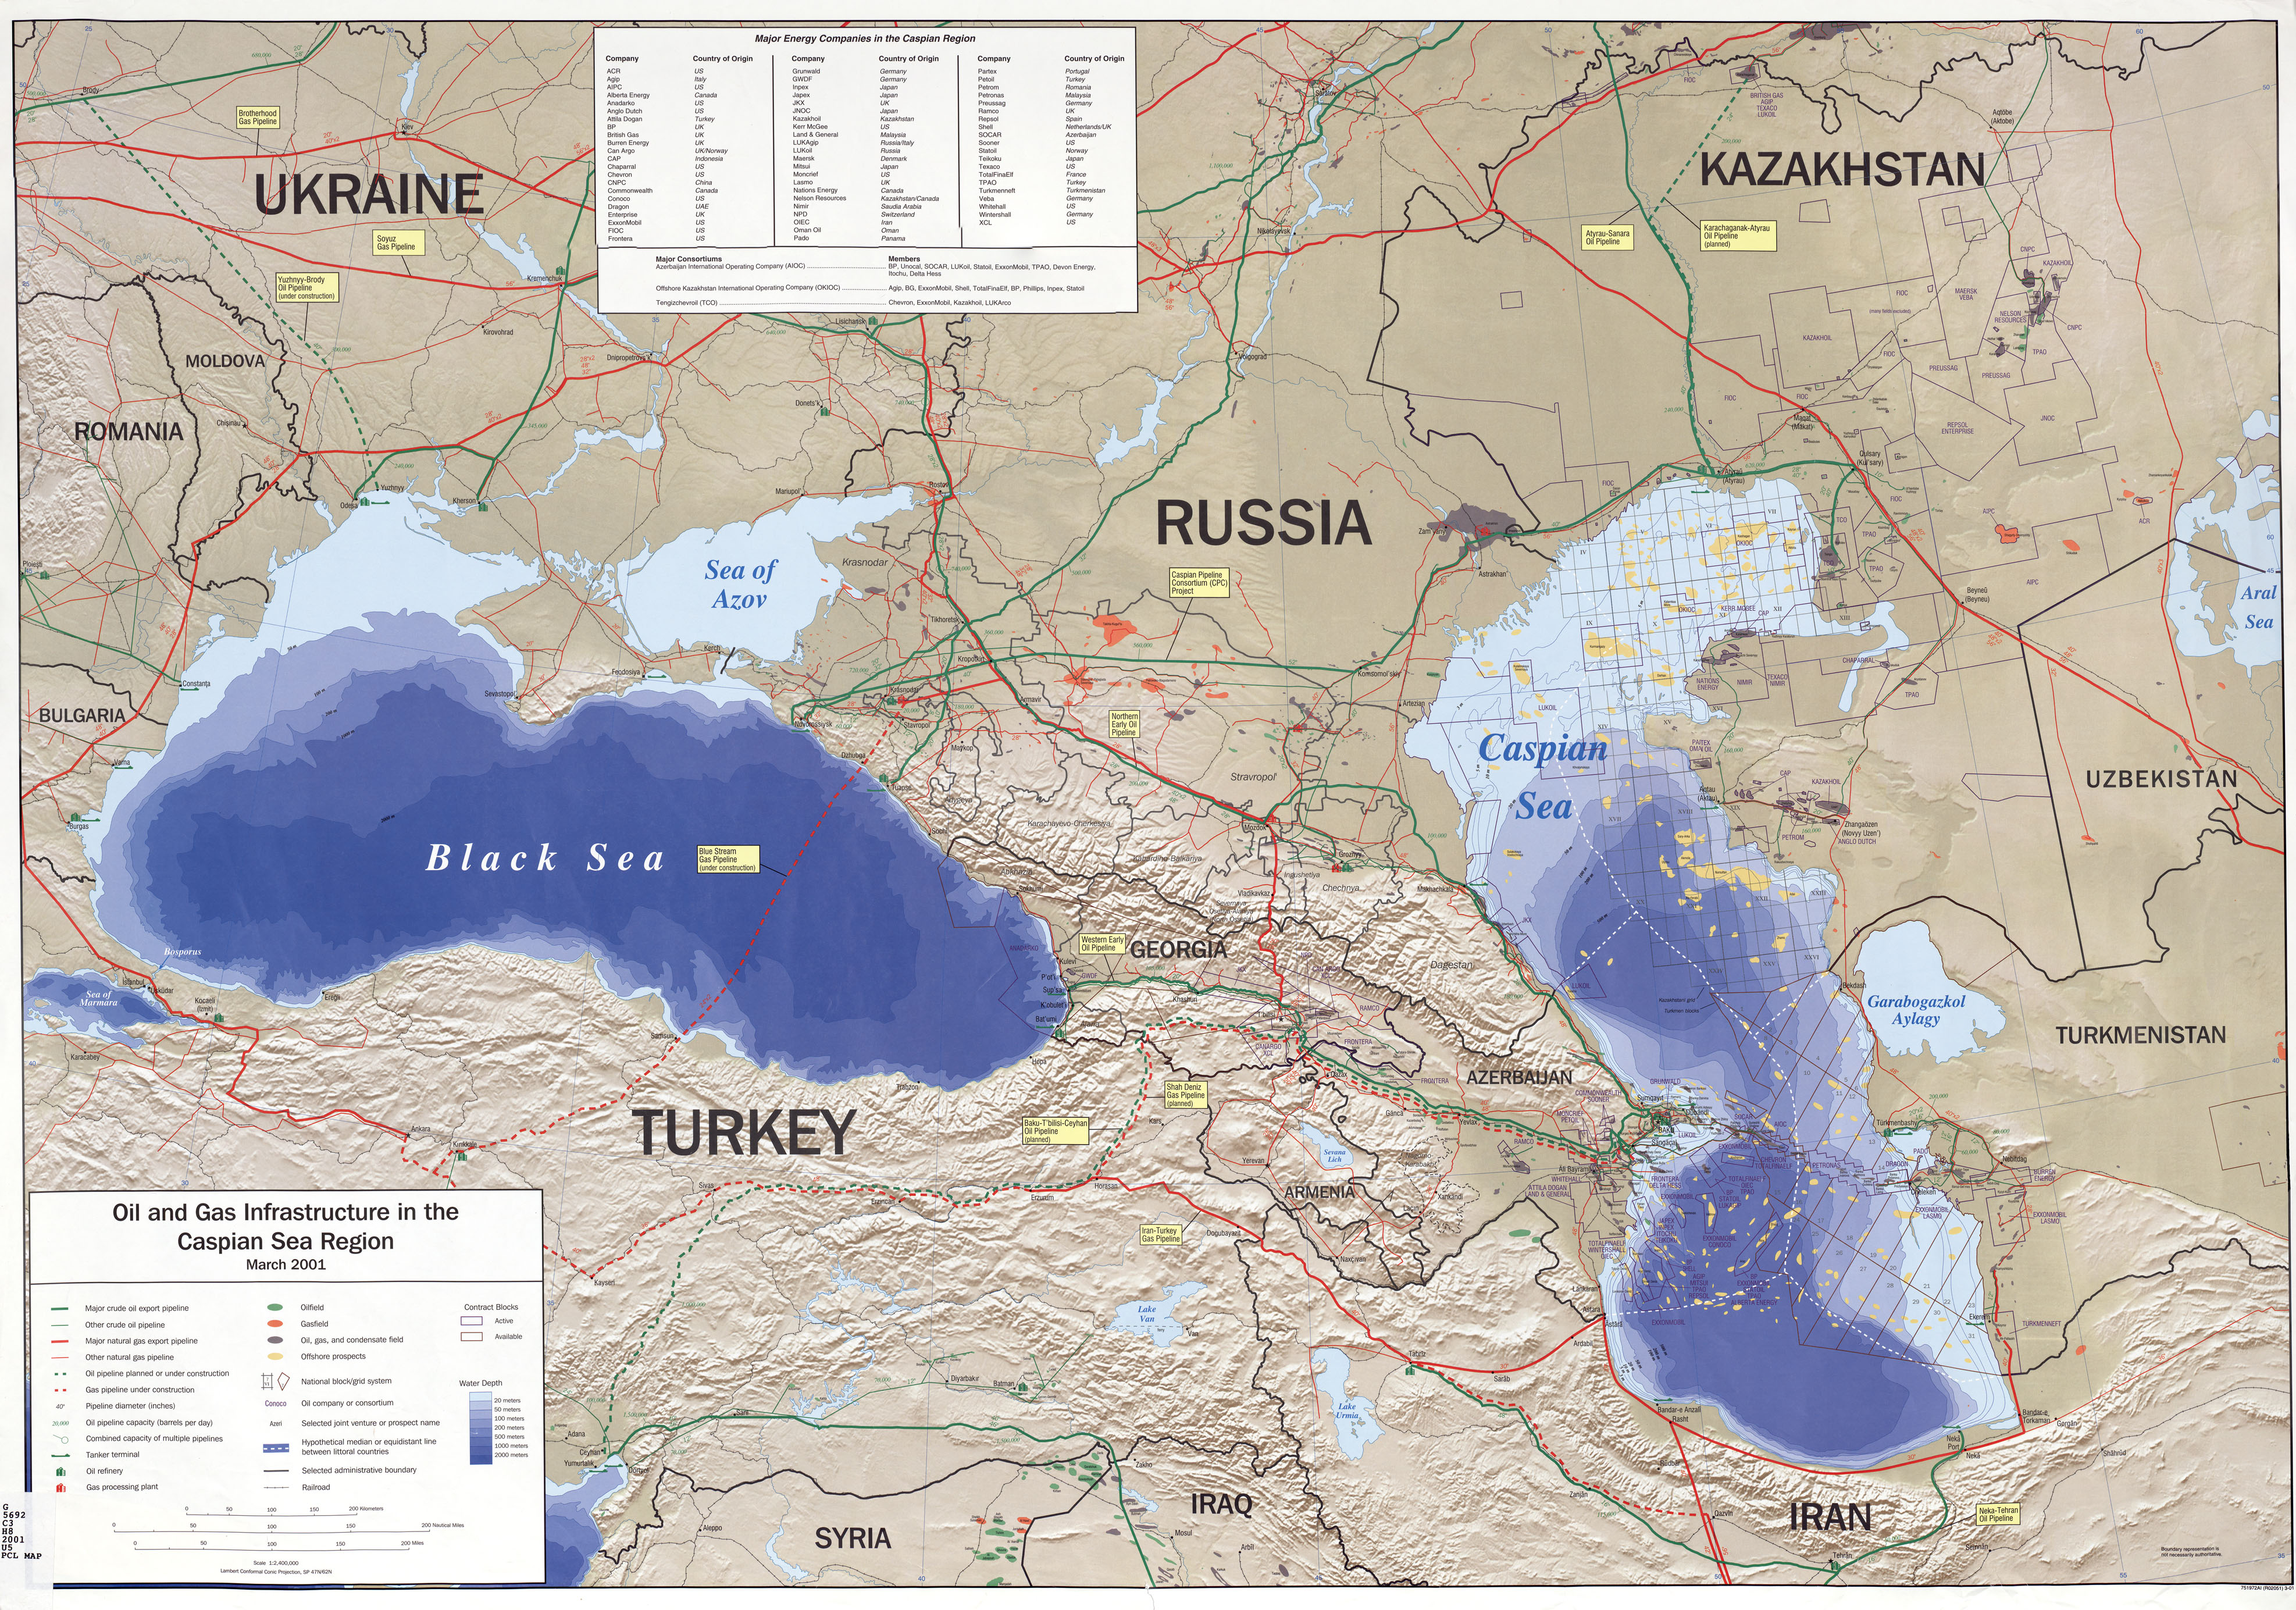 Download Free Russia Maps on vladivostok map, serpukhov russia map, bashkiria russia map, yaroslavl russia map, tula russia map, grozny russia map, moscow map, tynda russia map, warsaw russia map, crimea russia map, novgorod russia map, volsk russia map, astrakhan russia map, markovo russia map, ufa russia map, irkutsk map, tatarstan russia map, samara russia map, elista russia map, yurga russia map,